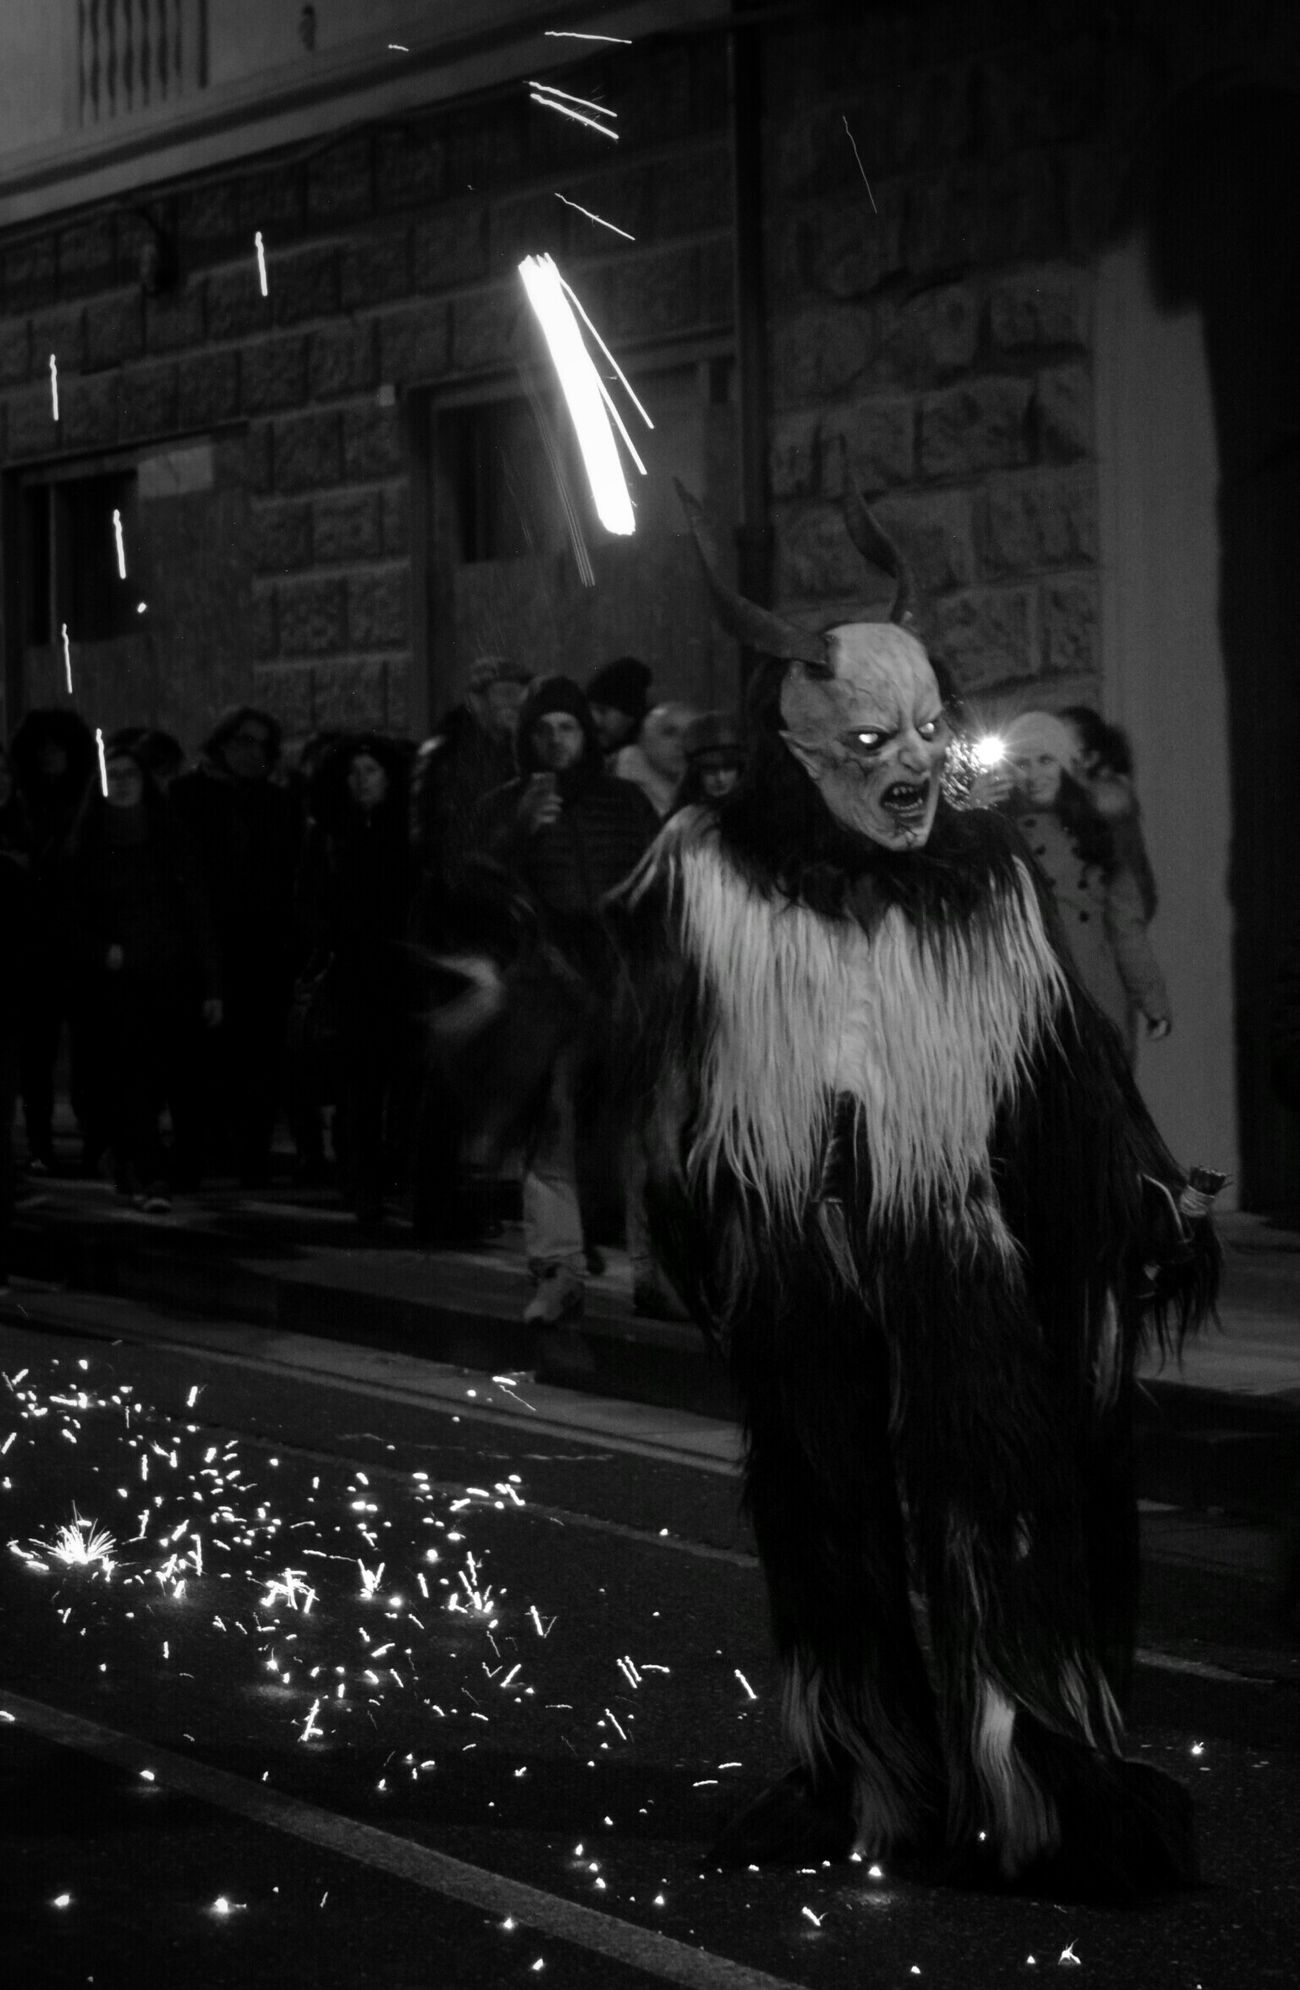 Night Photography Sparks Demon Sardinia Sardegna Italy  Culture Parade Sardegna Nikon D5200 Carnevale B&w Street Photography Streetphoto_bw Nightphotography Krampus Horns Costume Black And White Mask Black & White Black And White Photography